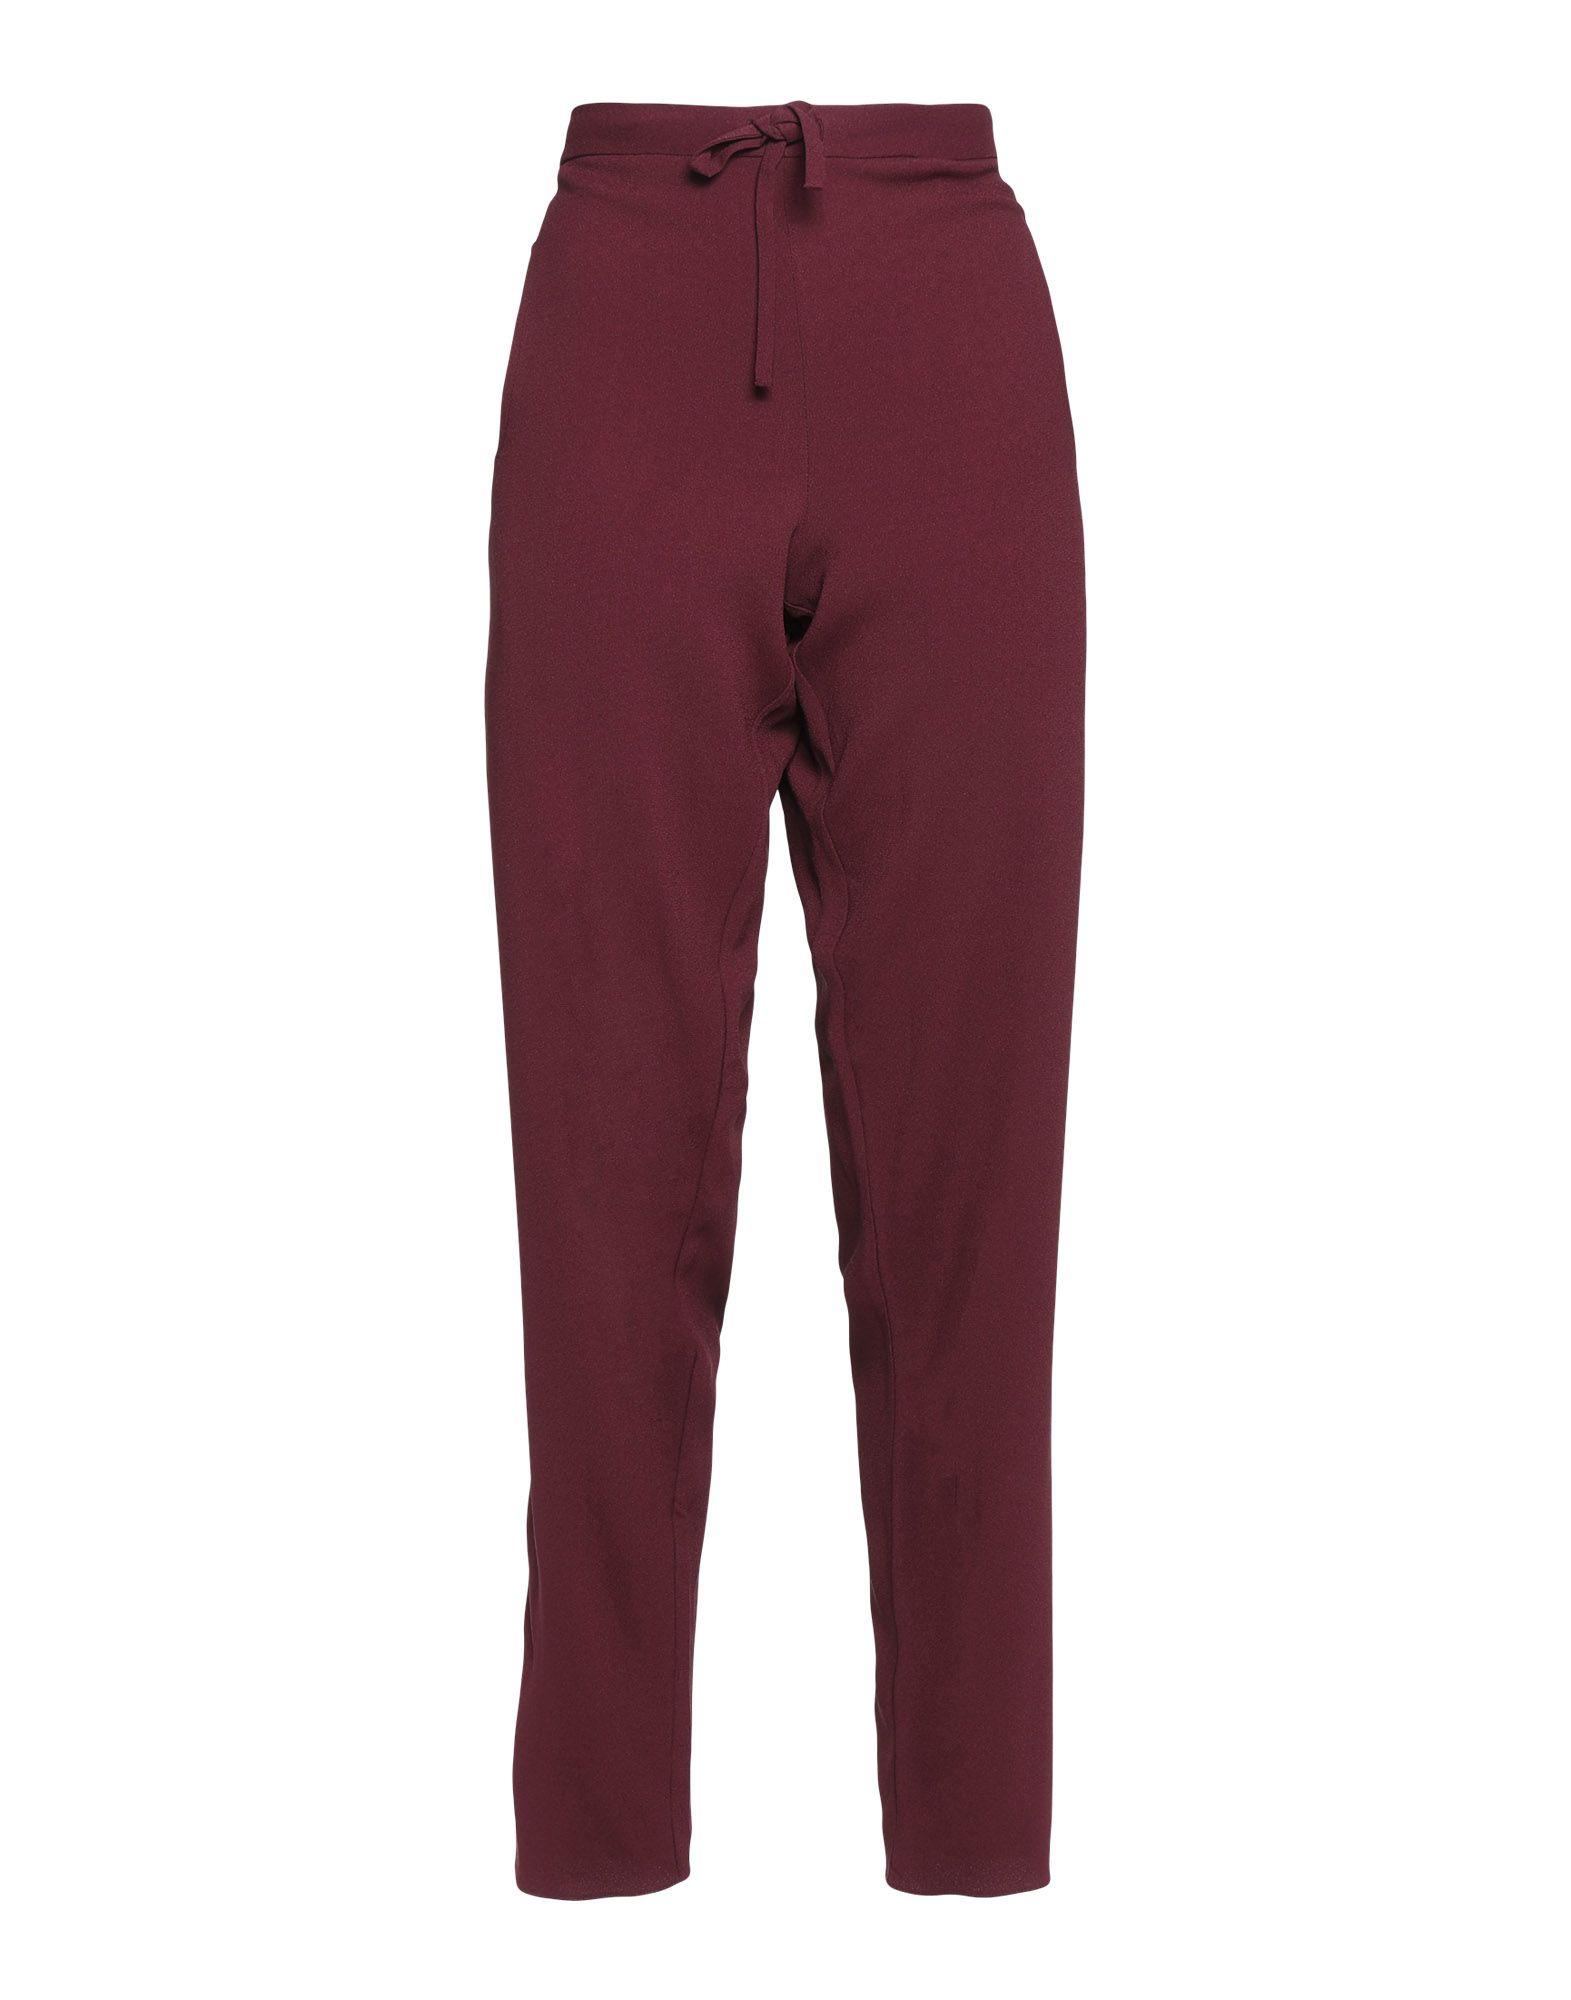 Pantalone Maria Grachvogel Donna - Acquista online su 68HF3IFM